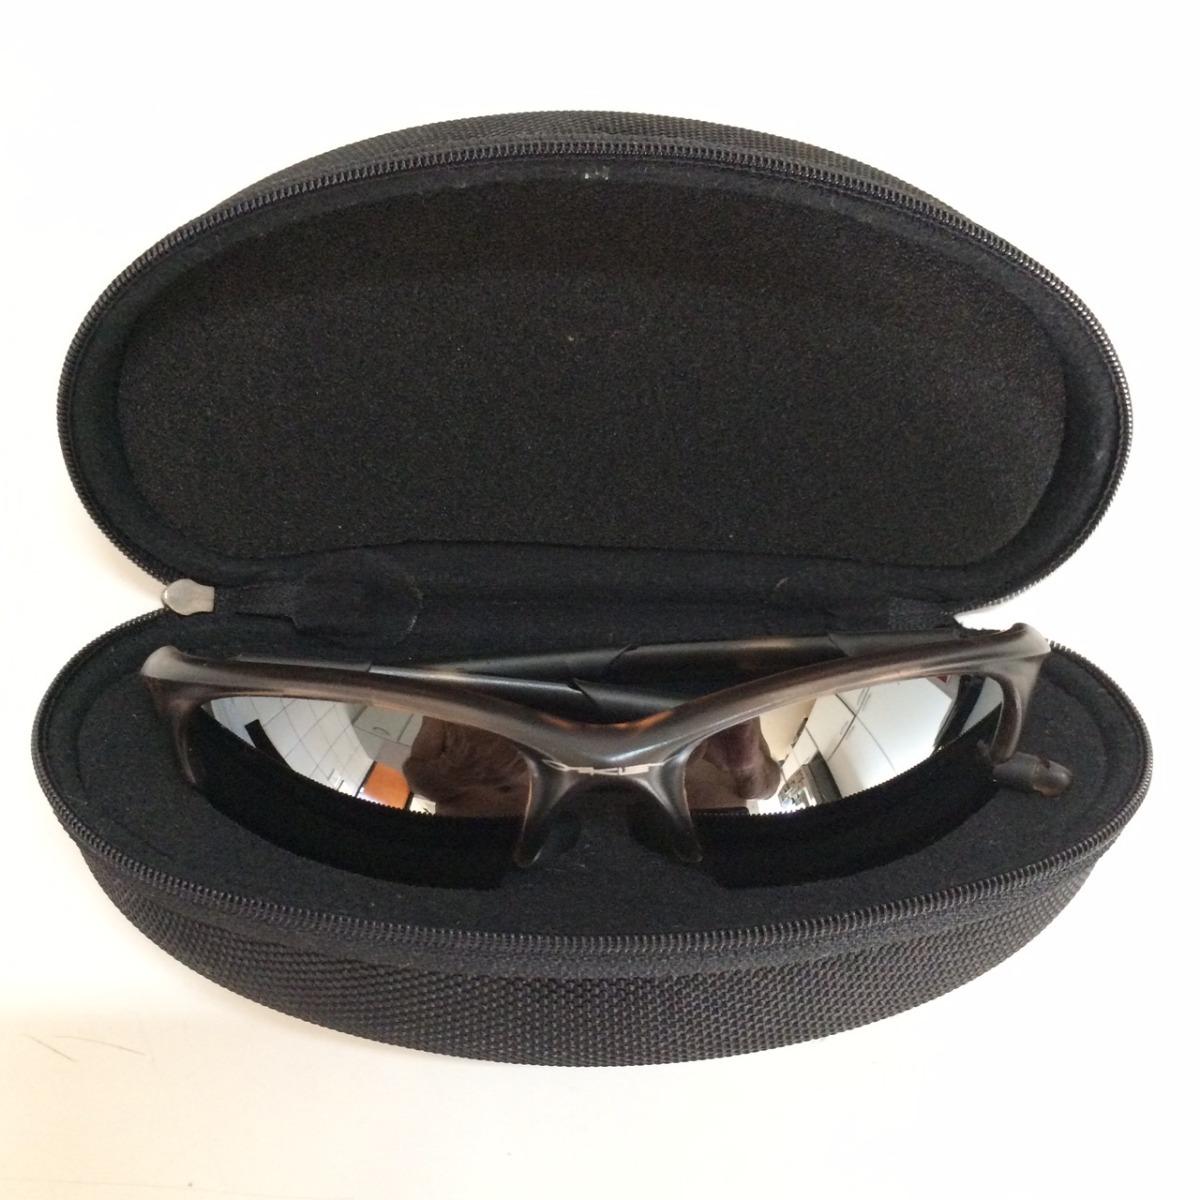 6e25f1a39e9ec óculos sol oakley flak jacket xlj genuíno polarizado marrom. Carregando zoom .